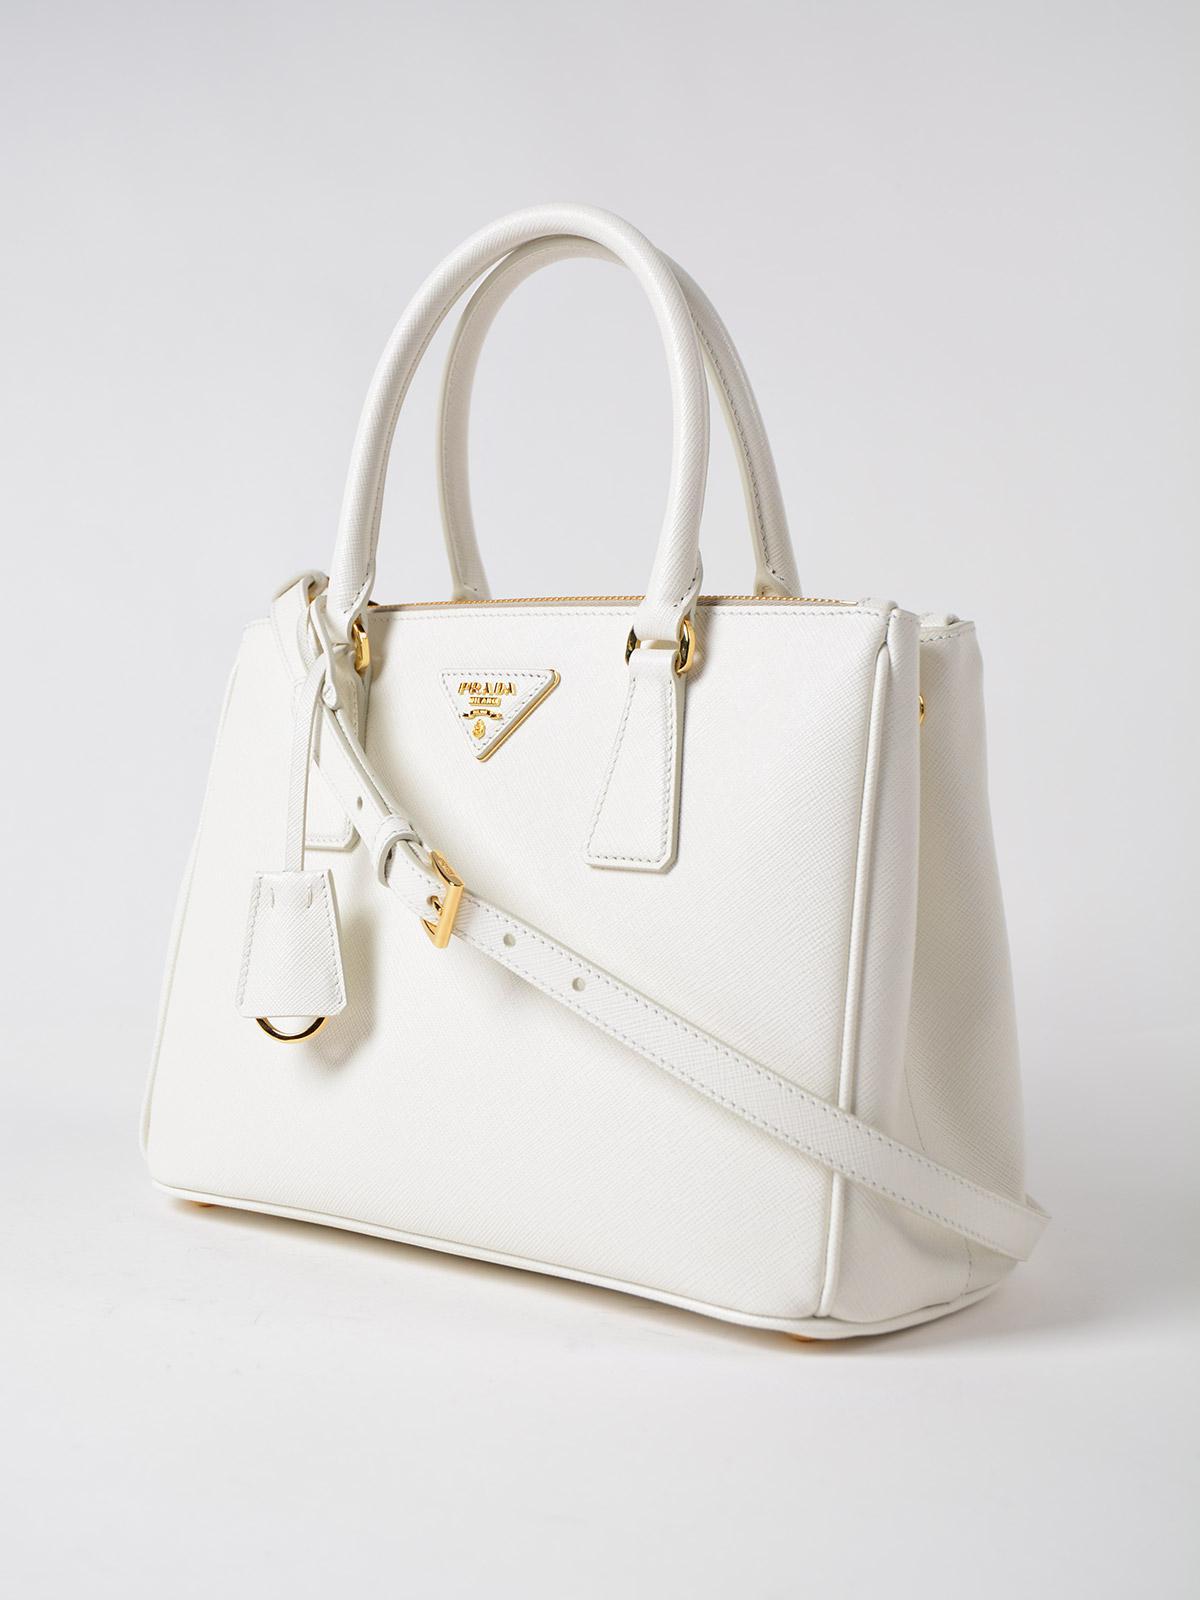 d5eaaee6daf6 Prada Saffiano Lux Galleria Bag in White - Lyst